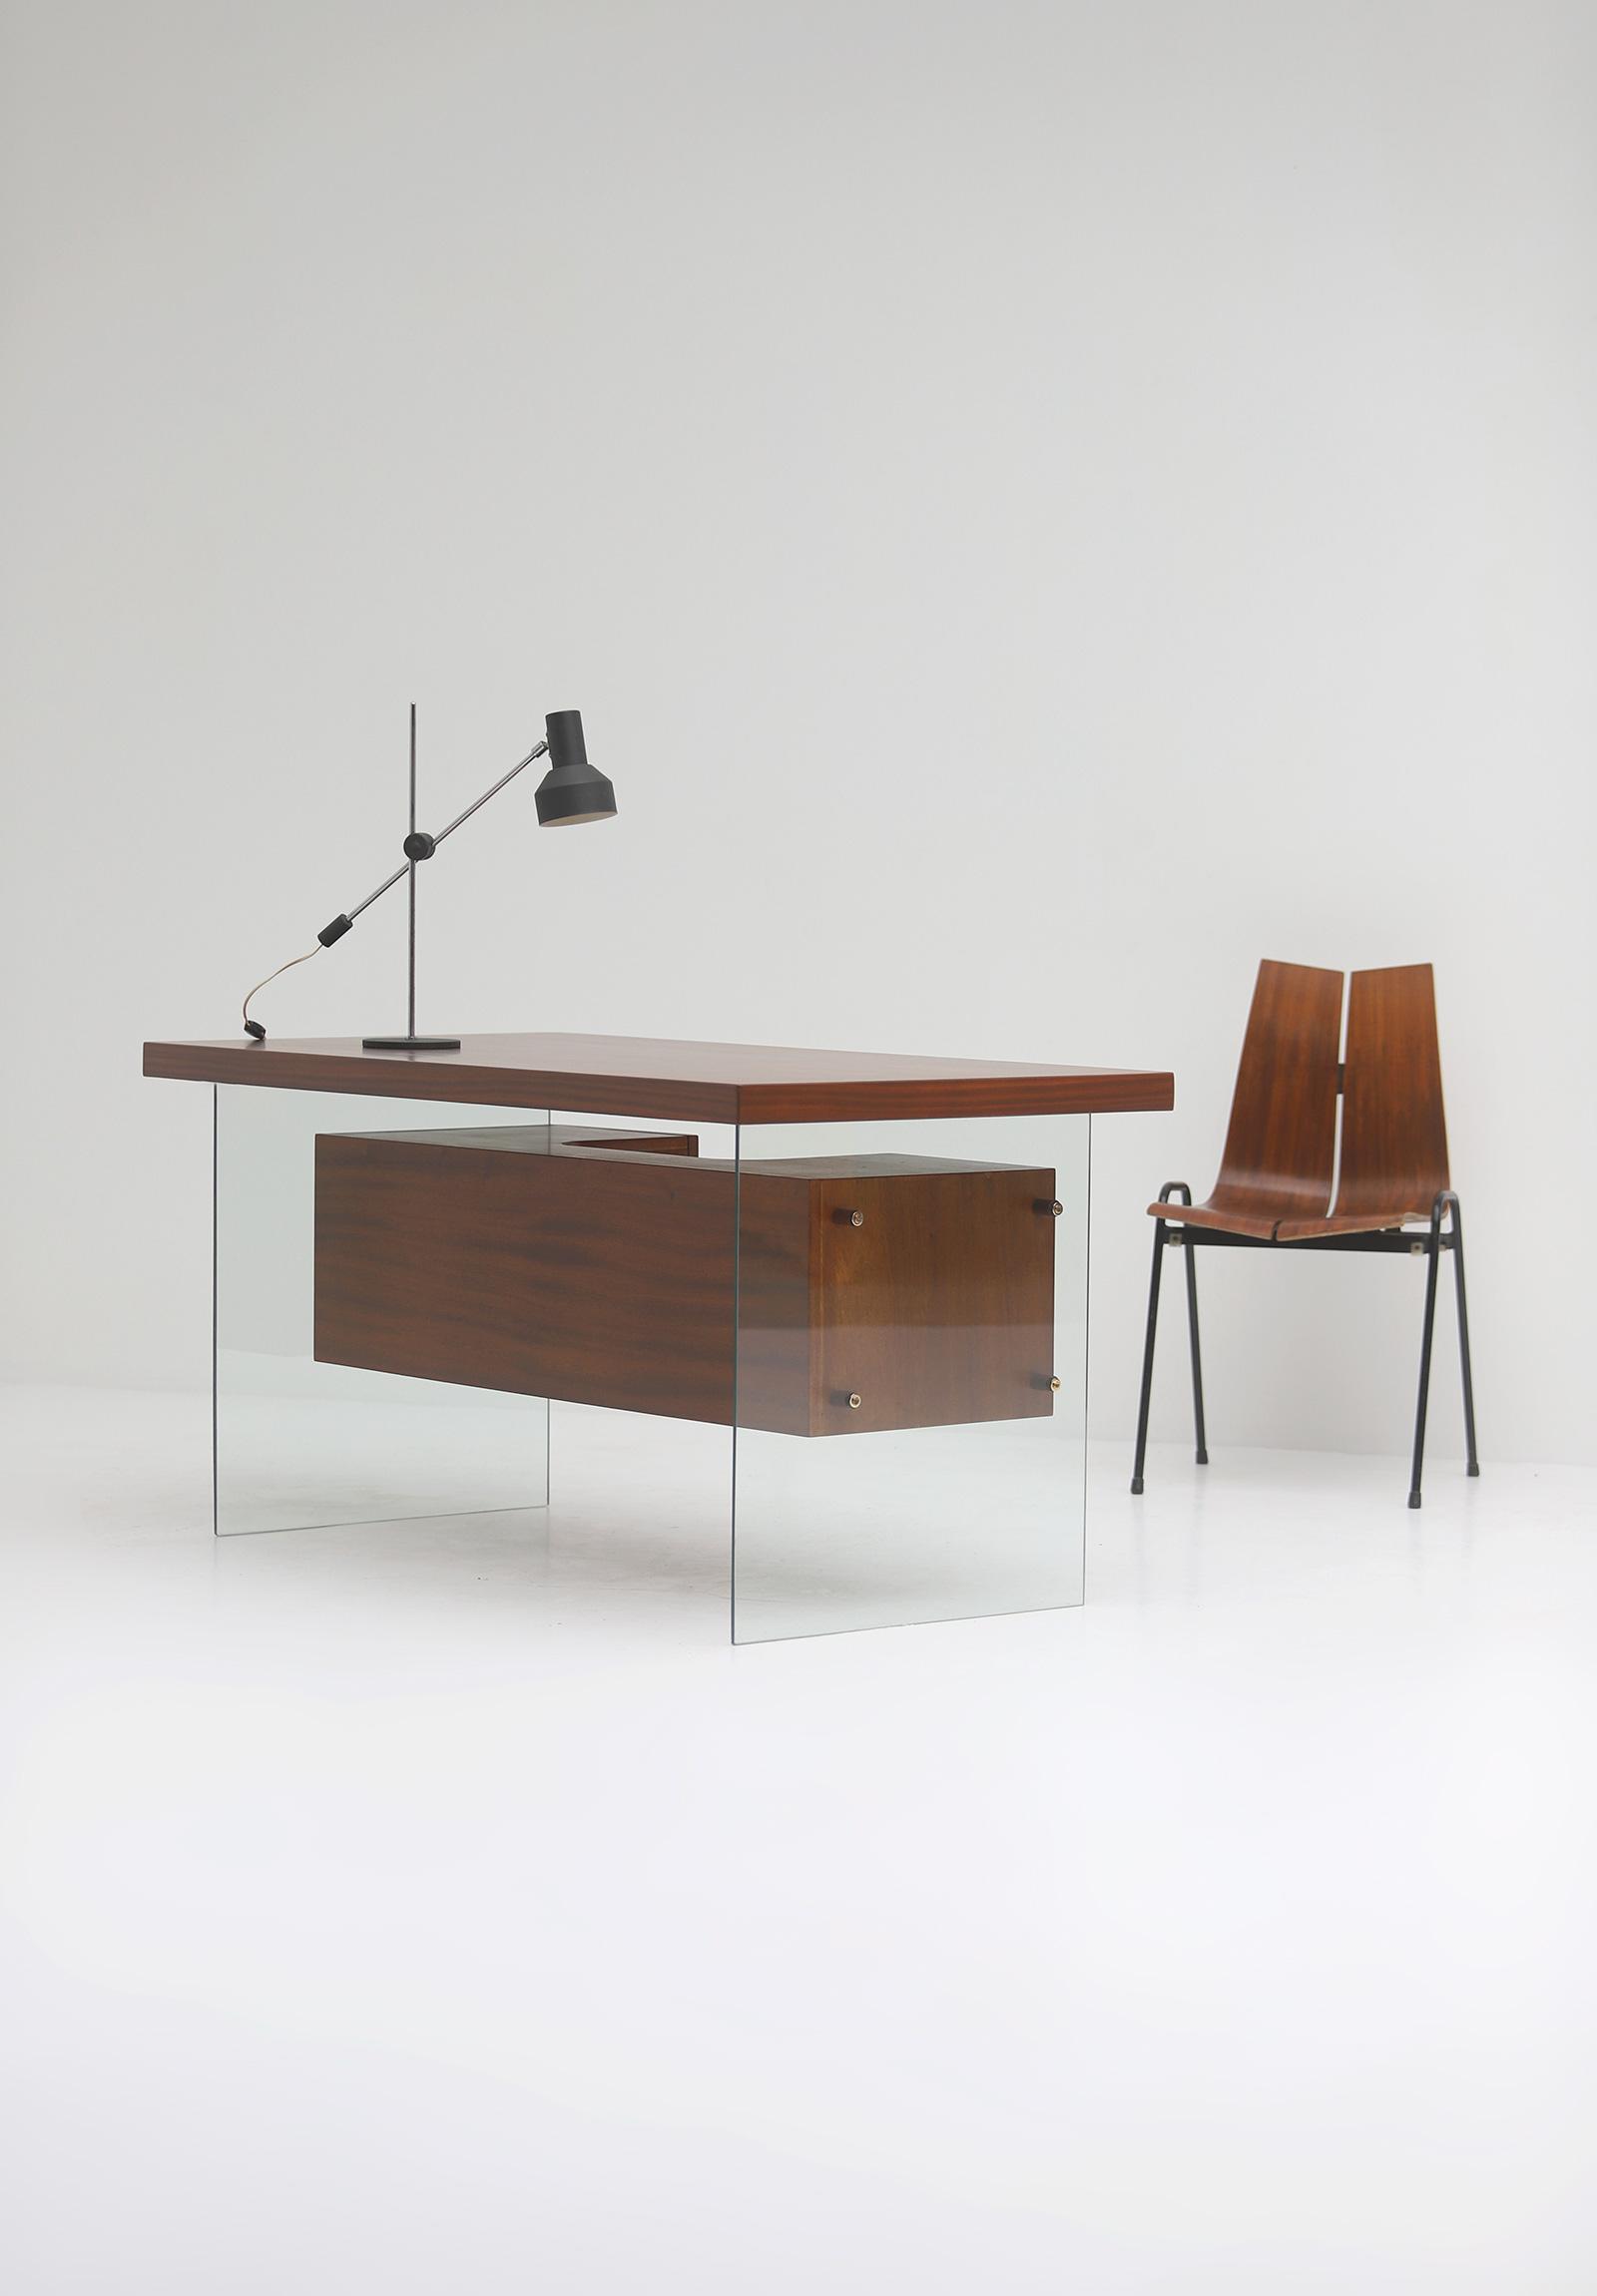 Modernist desk in the manner of Jacques Dumond, 1950simage 1